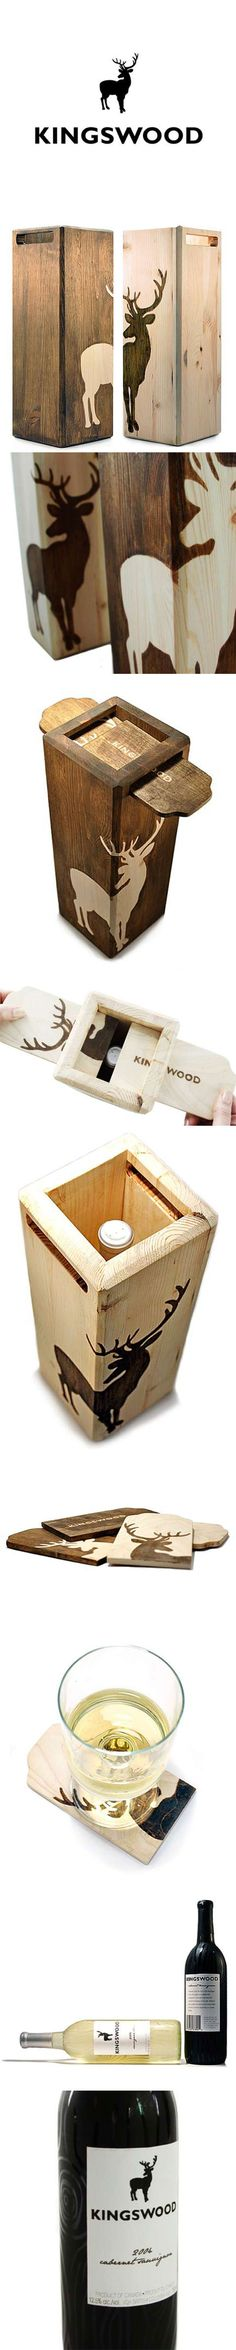 Wild Wood Branding PD